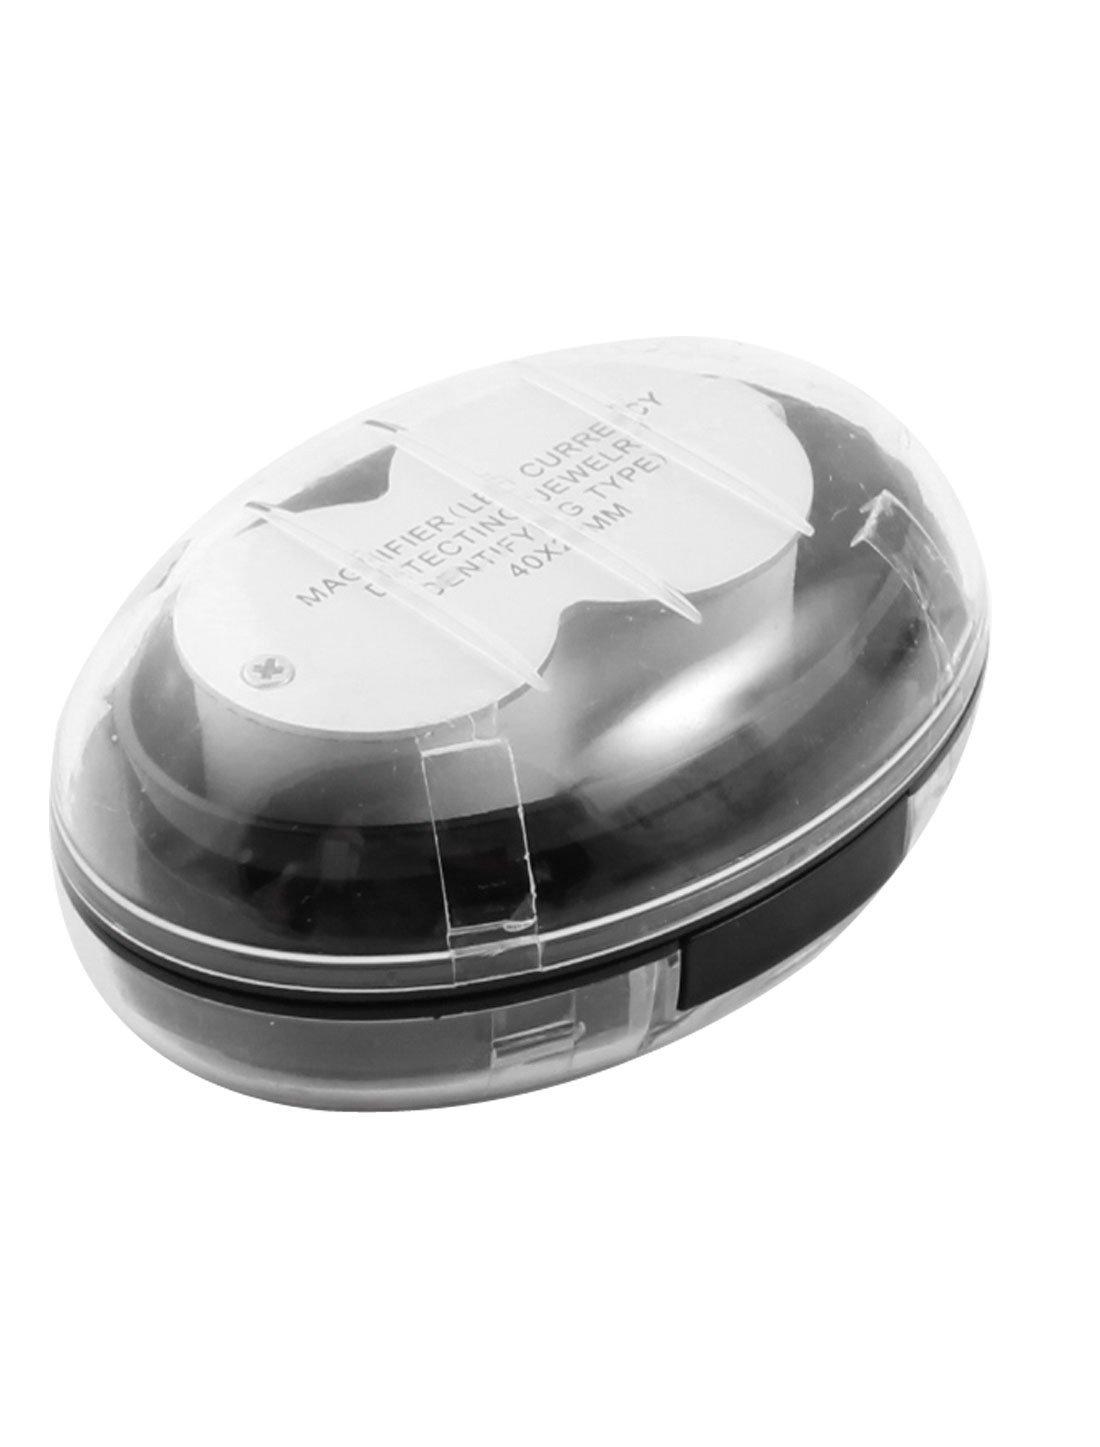 Amazon.com: eDealMax detección de la moneda plegable Lupa Lupa 40X 25mm 3 DE luz LED: Health & Personal Care